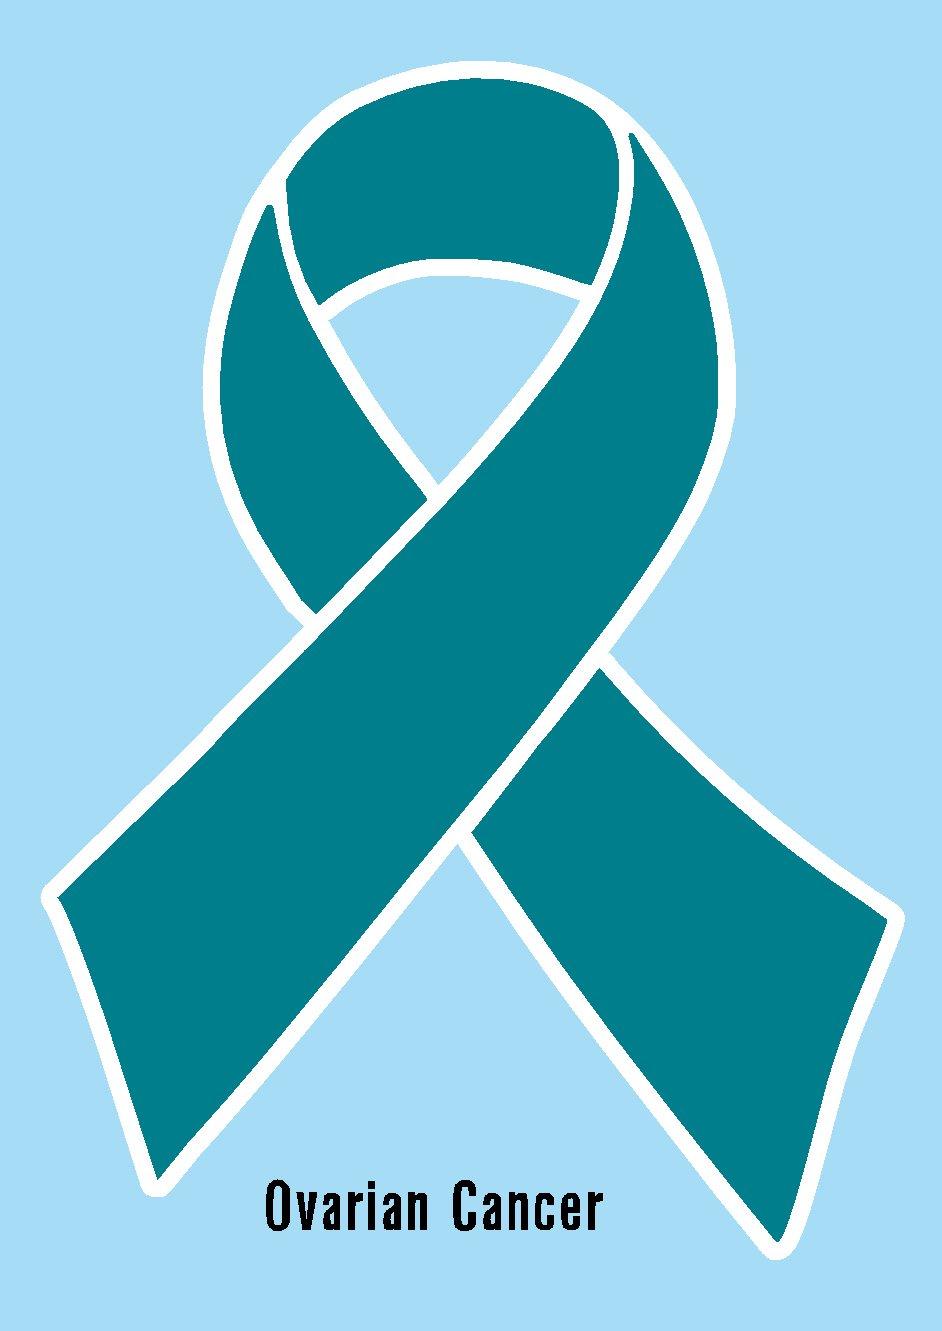 Amazon Ovarian Cancer Ribbon Teal Printed Vinyl Decal